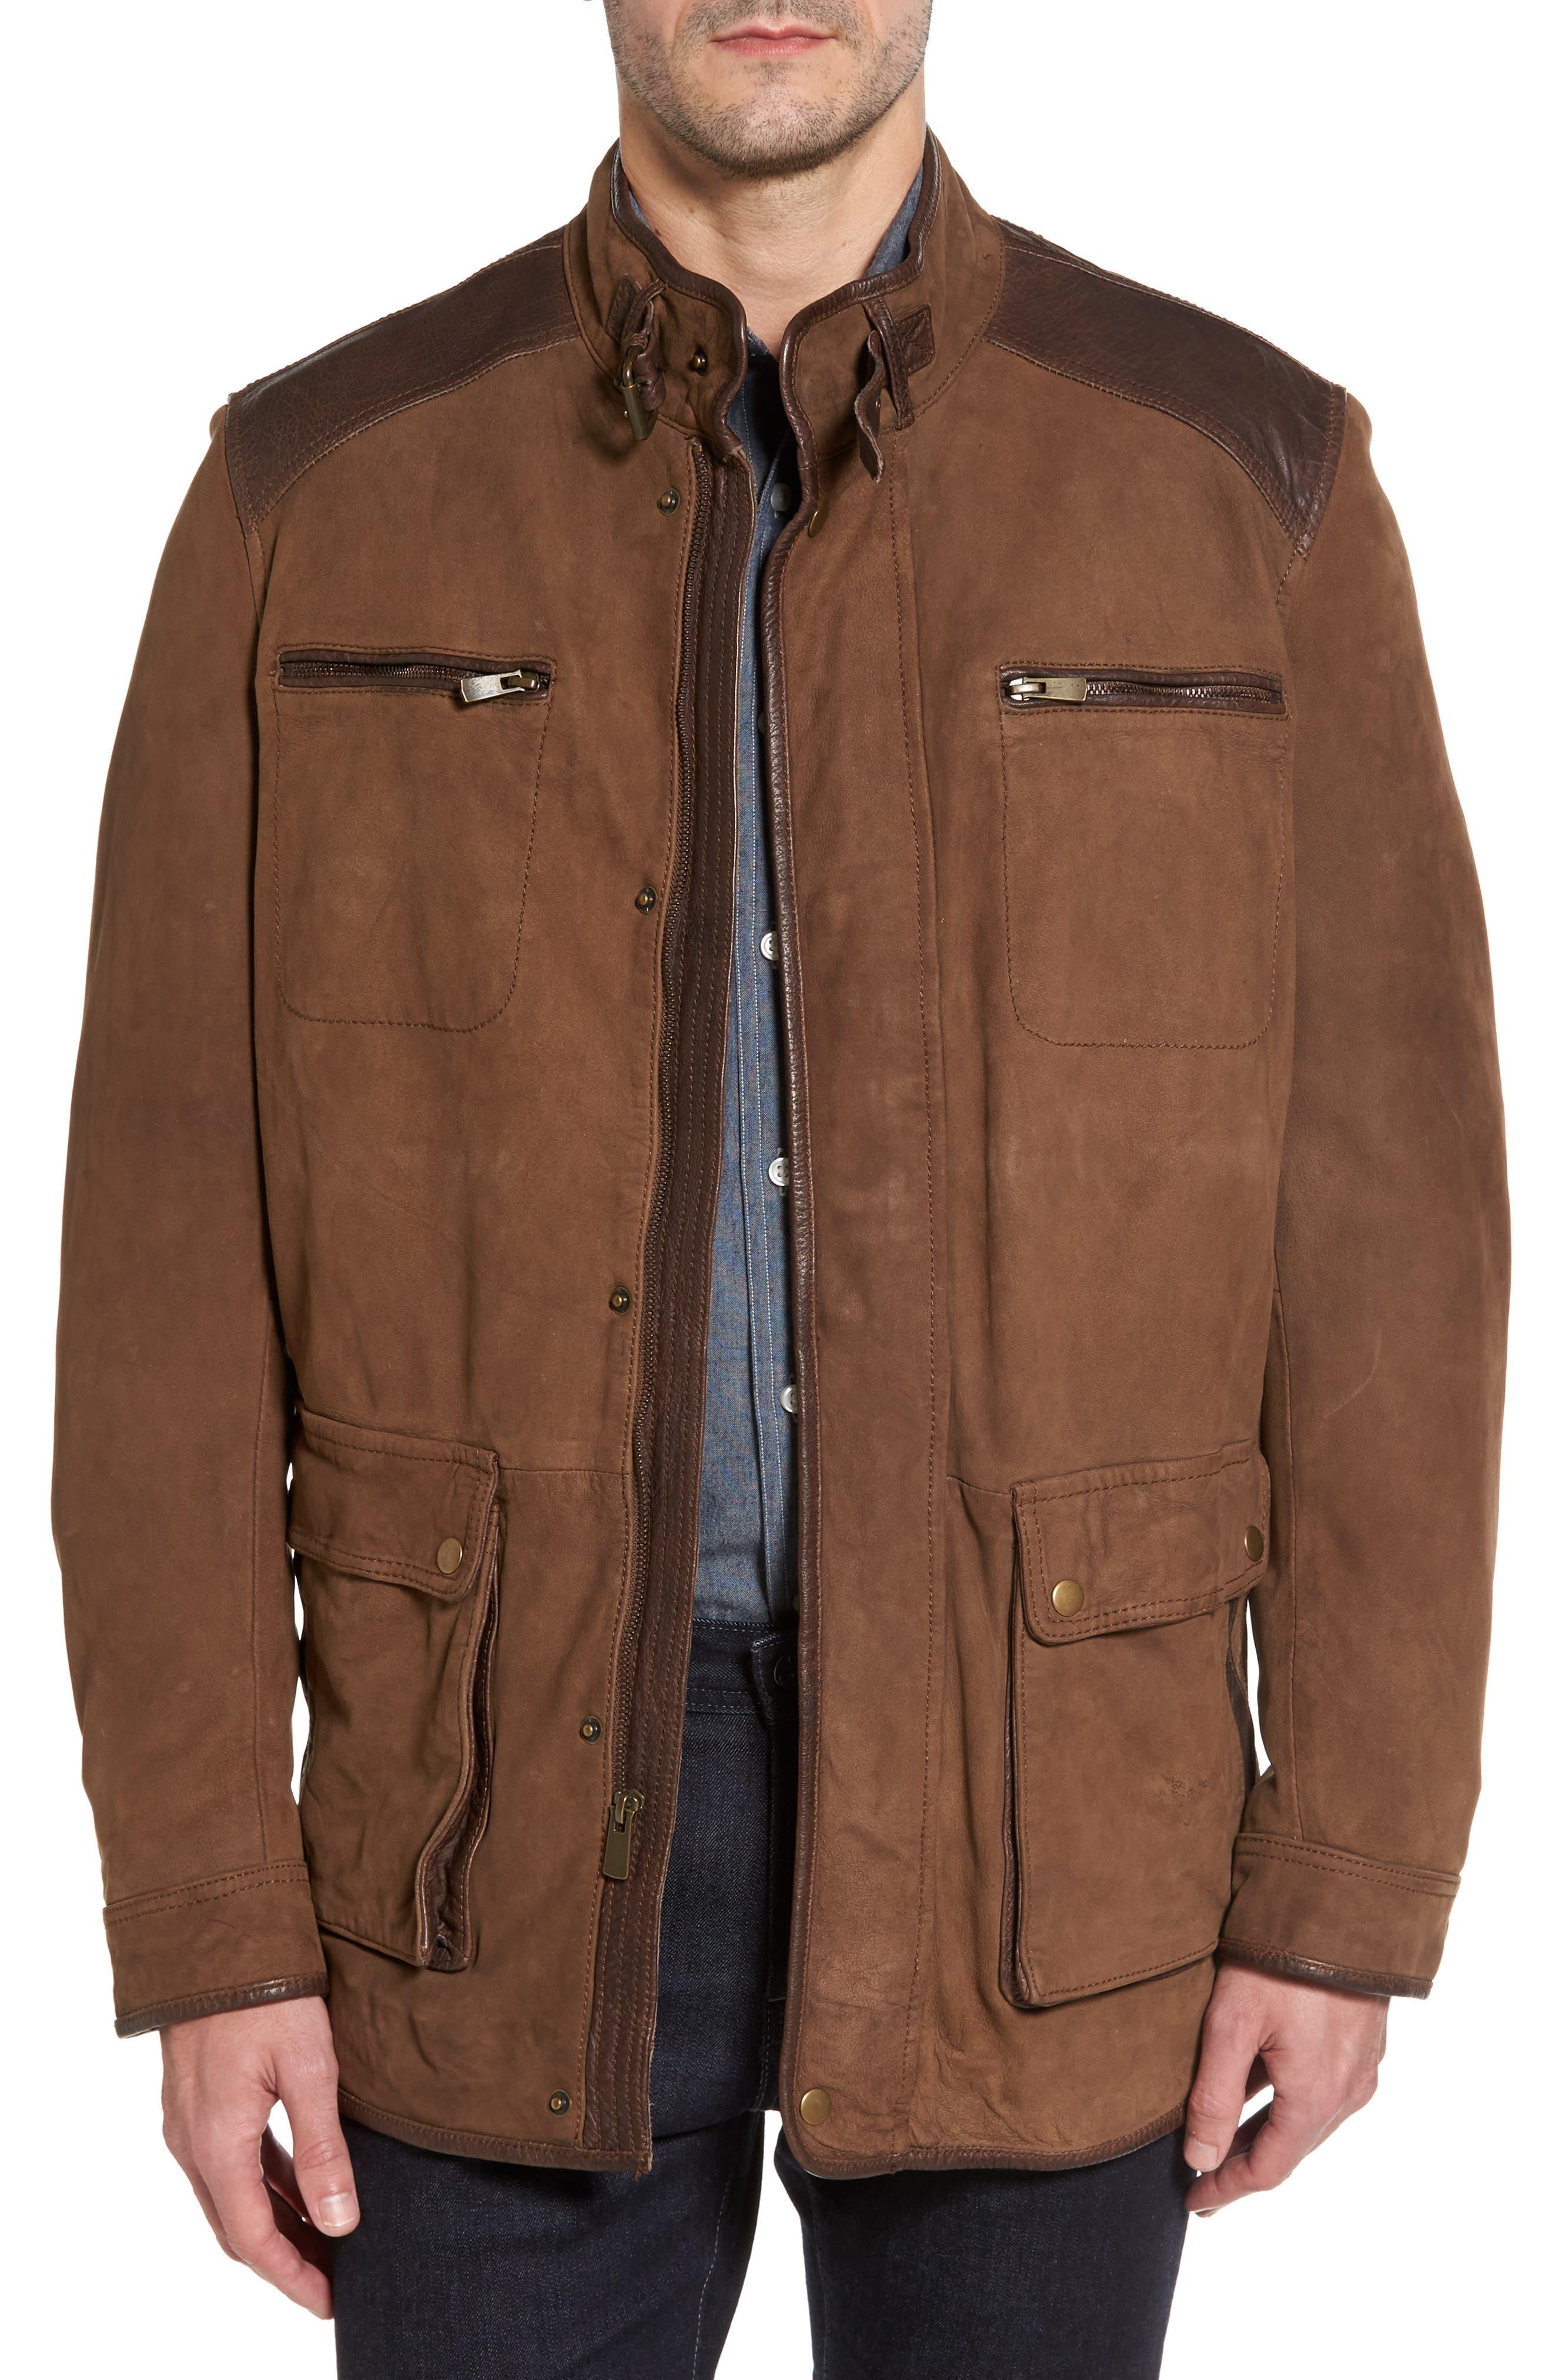 Alternate Image 1 Selected - Missani Le Collezioni Leather Trim Nubuck Jacket